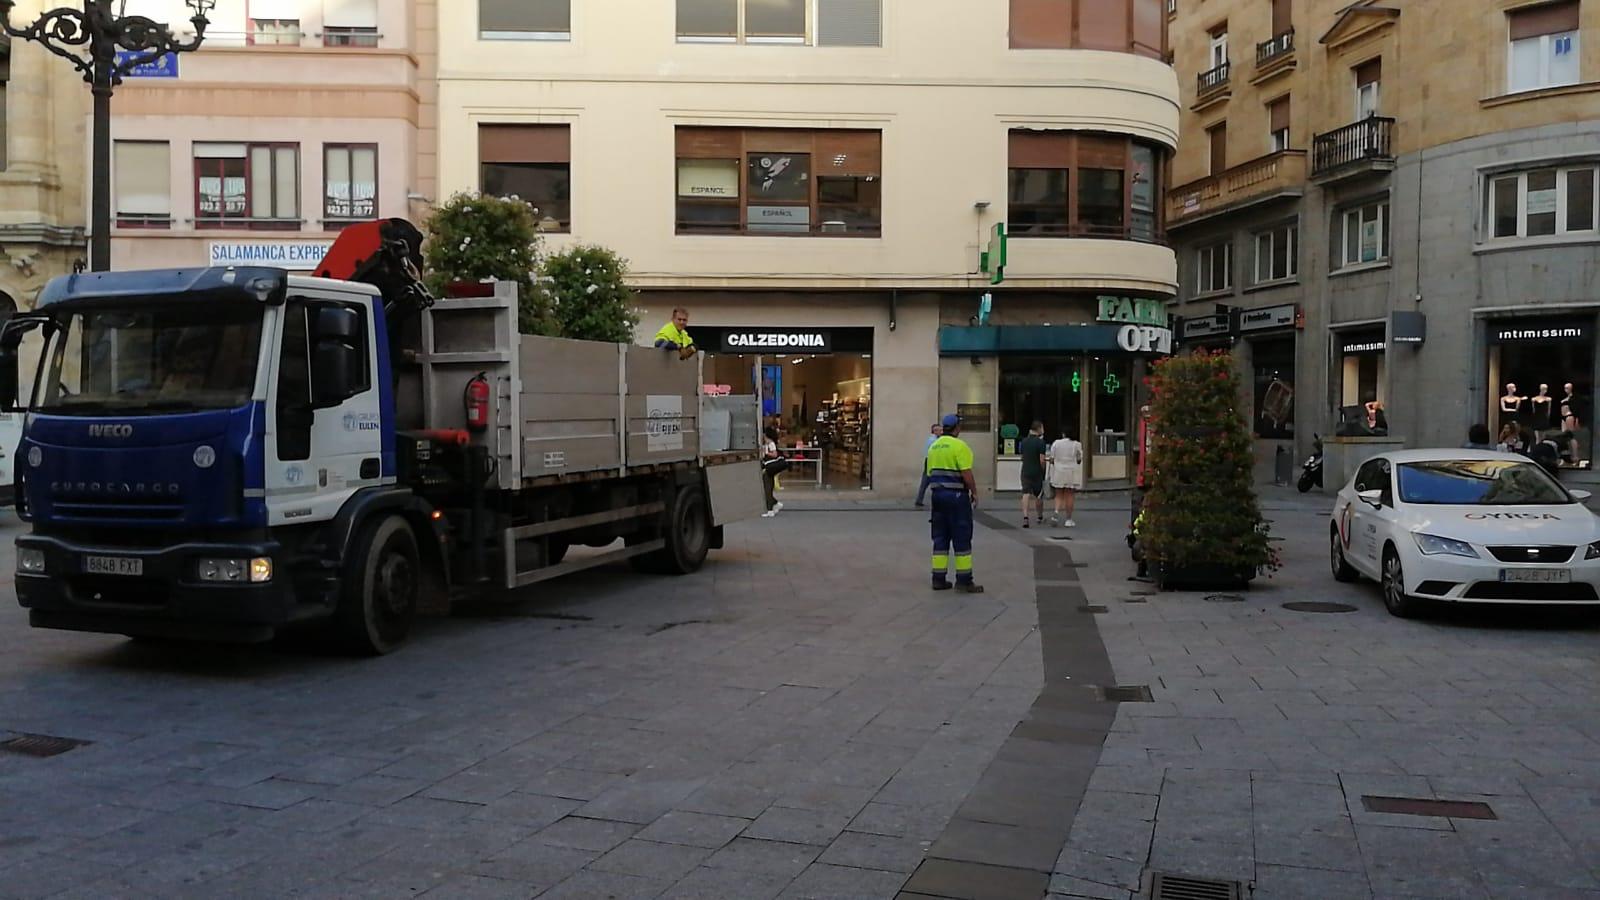 Jardineras de la calle Toro, Salamanca.